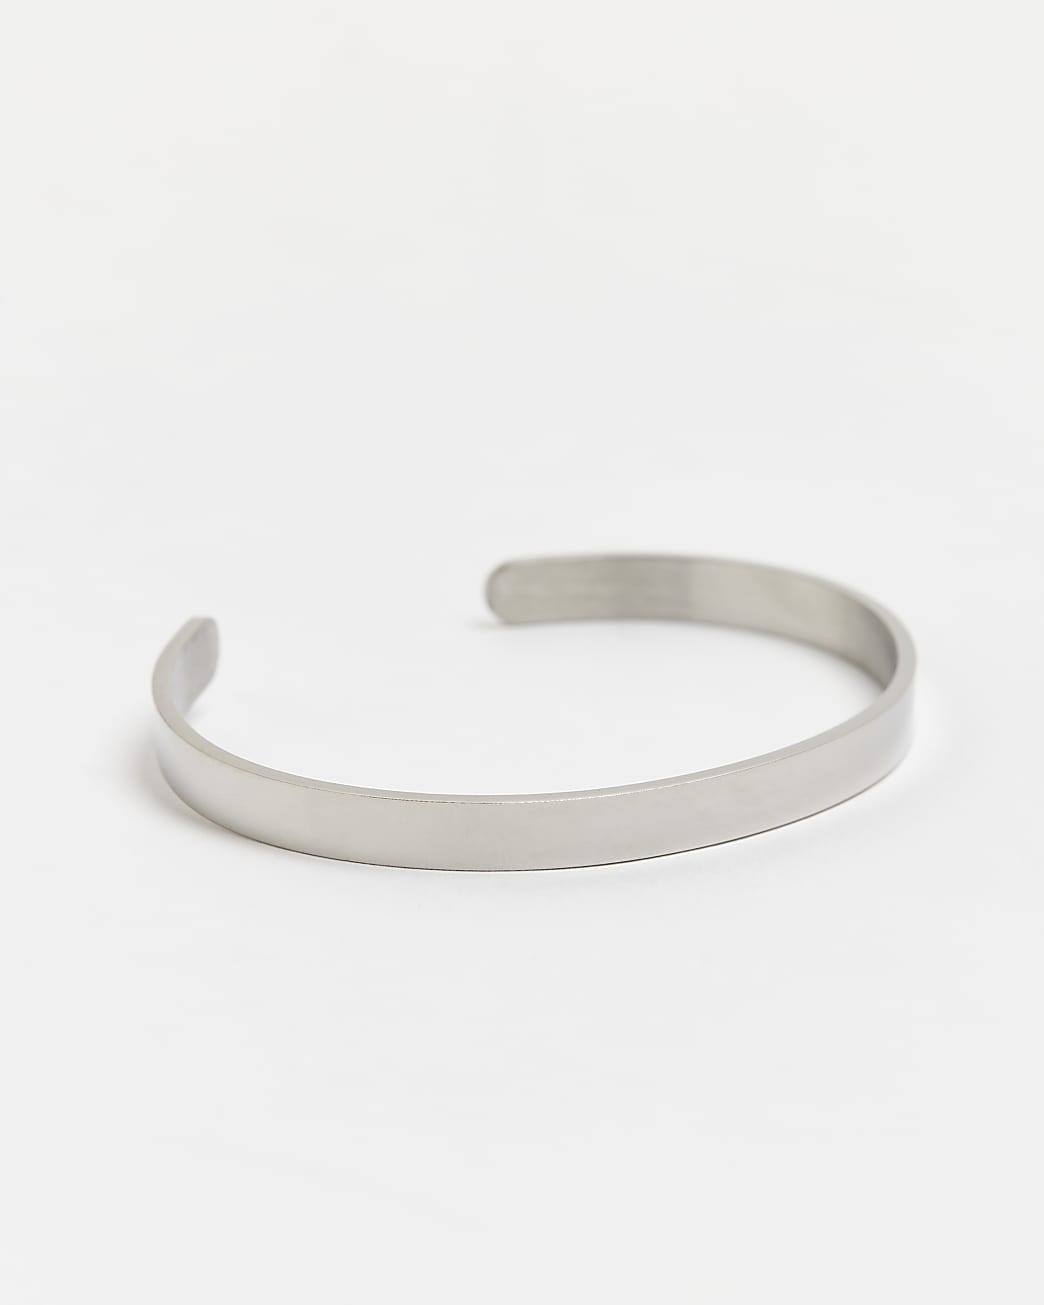 Silver stainless steel cuff bracelet